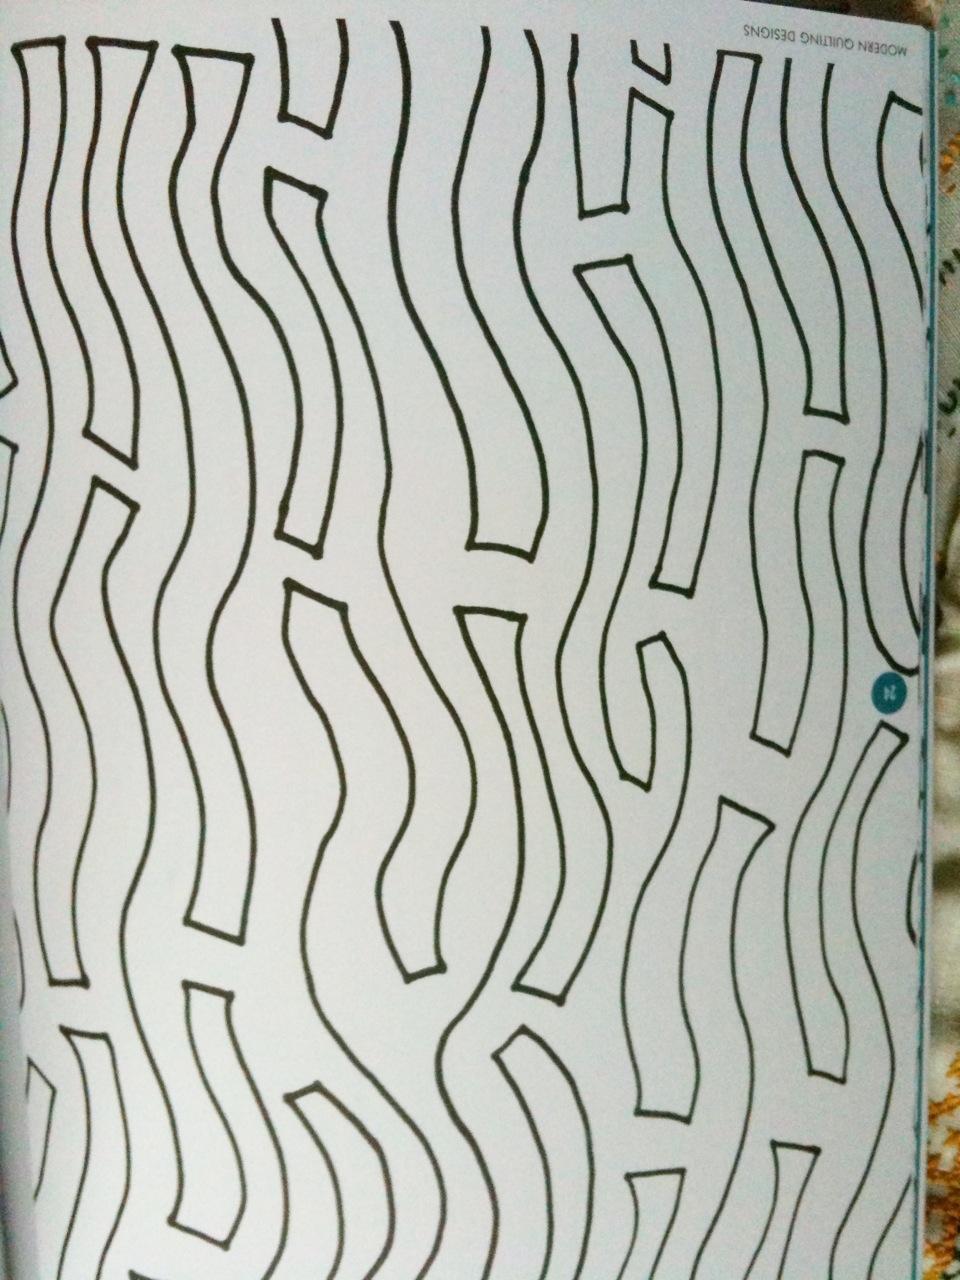 A Few Scraps Modern Quilting Designs Review